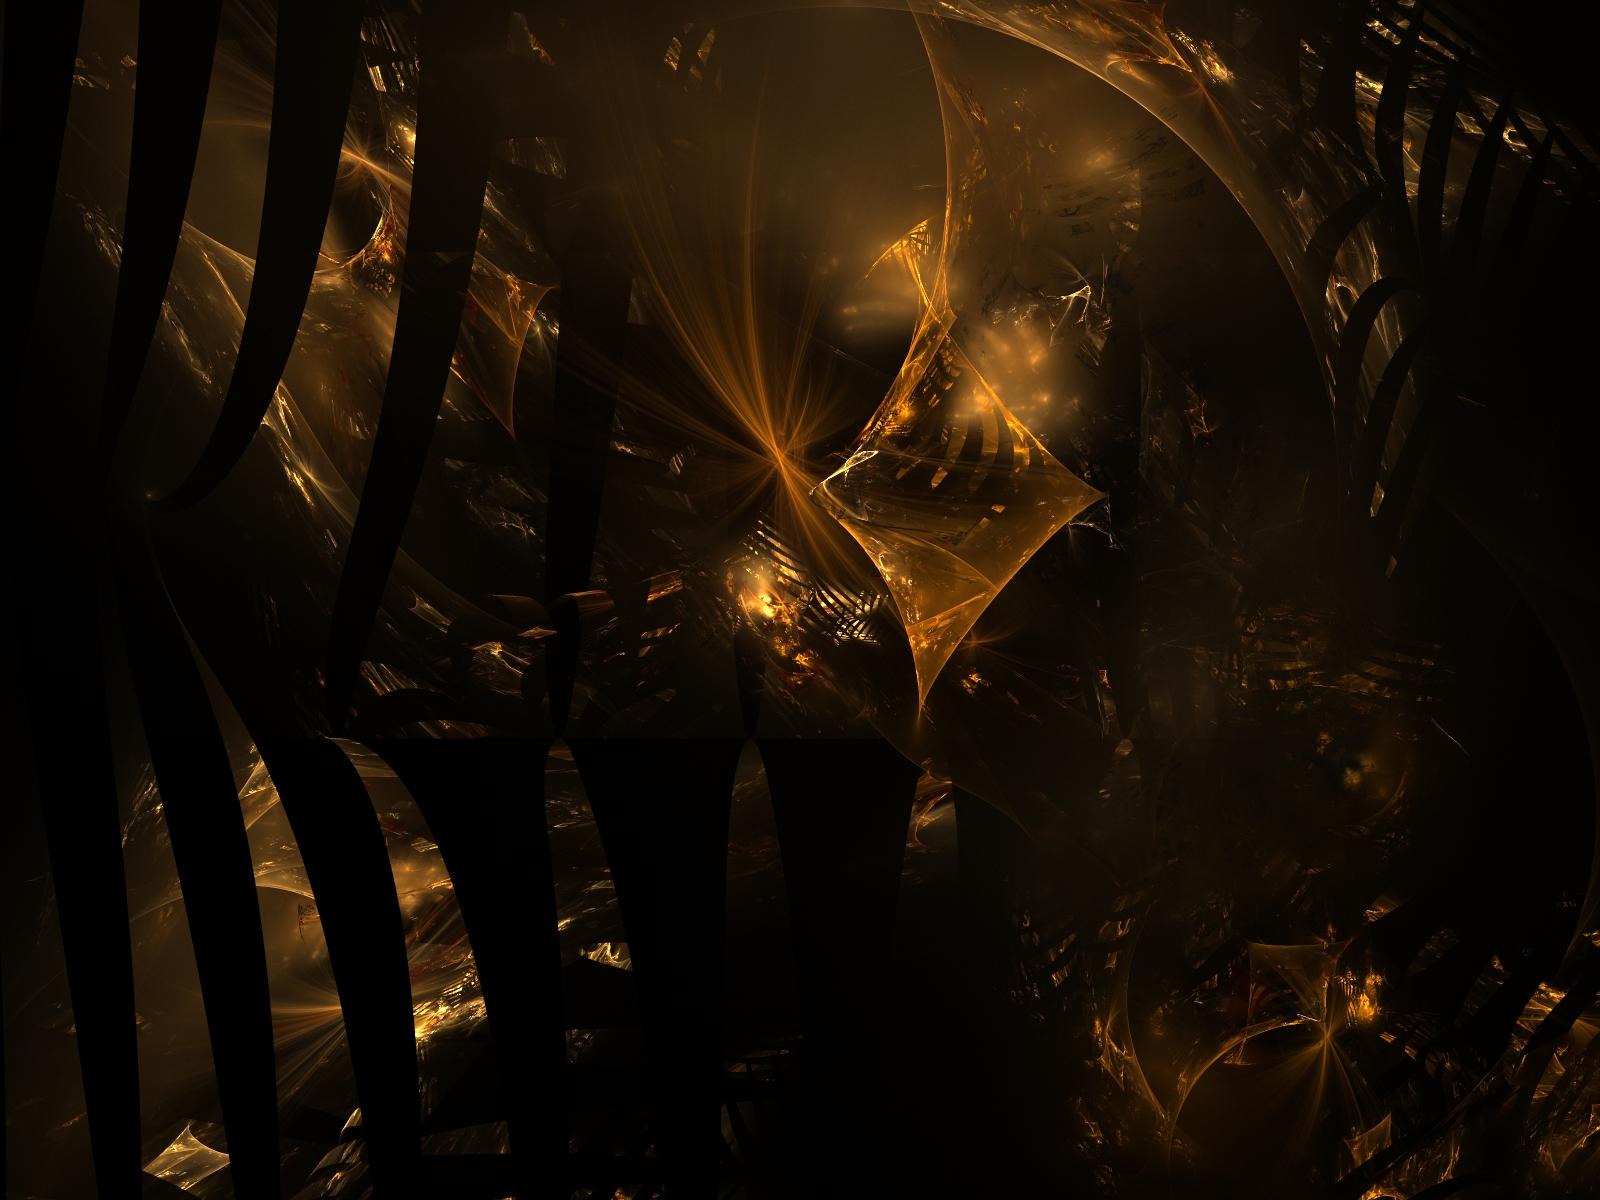 Dreamscape by montag451